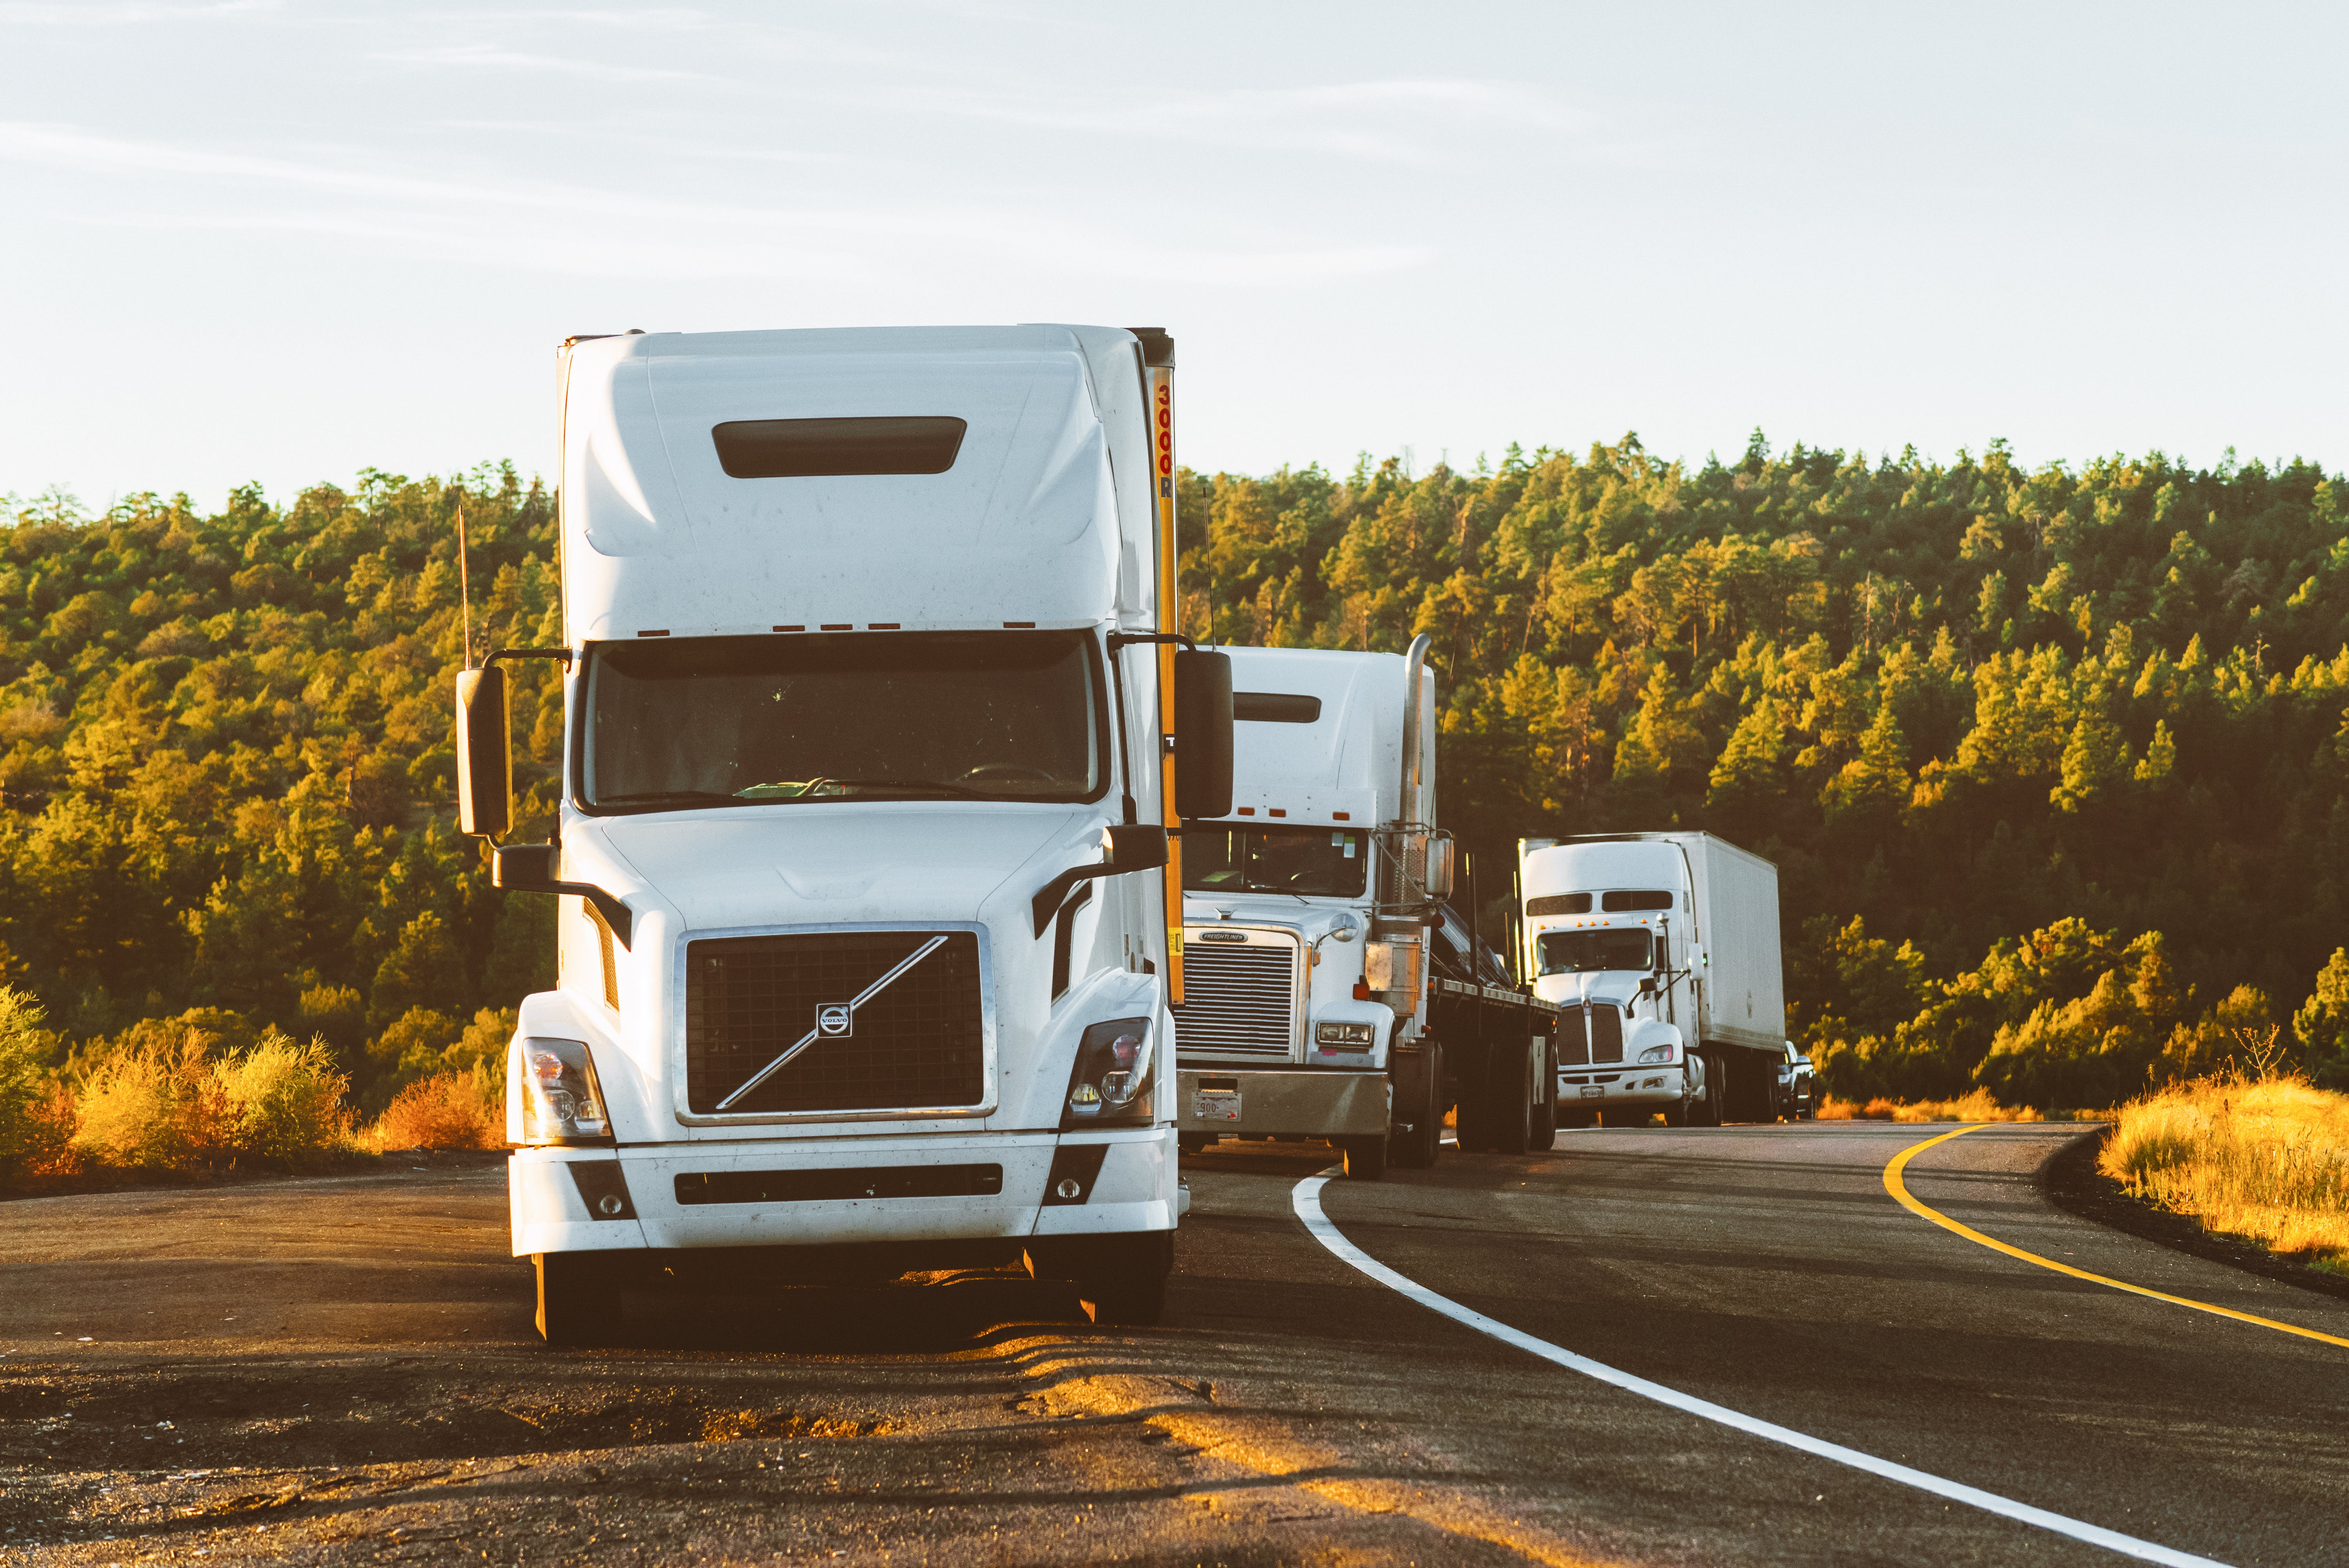 Gratis lagerfoto af arizona, asfalt, container, Fragt